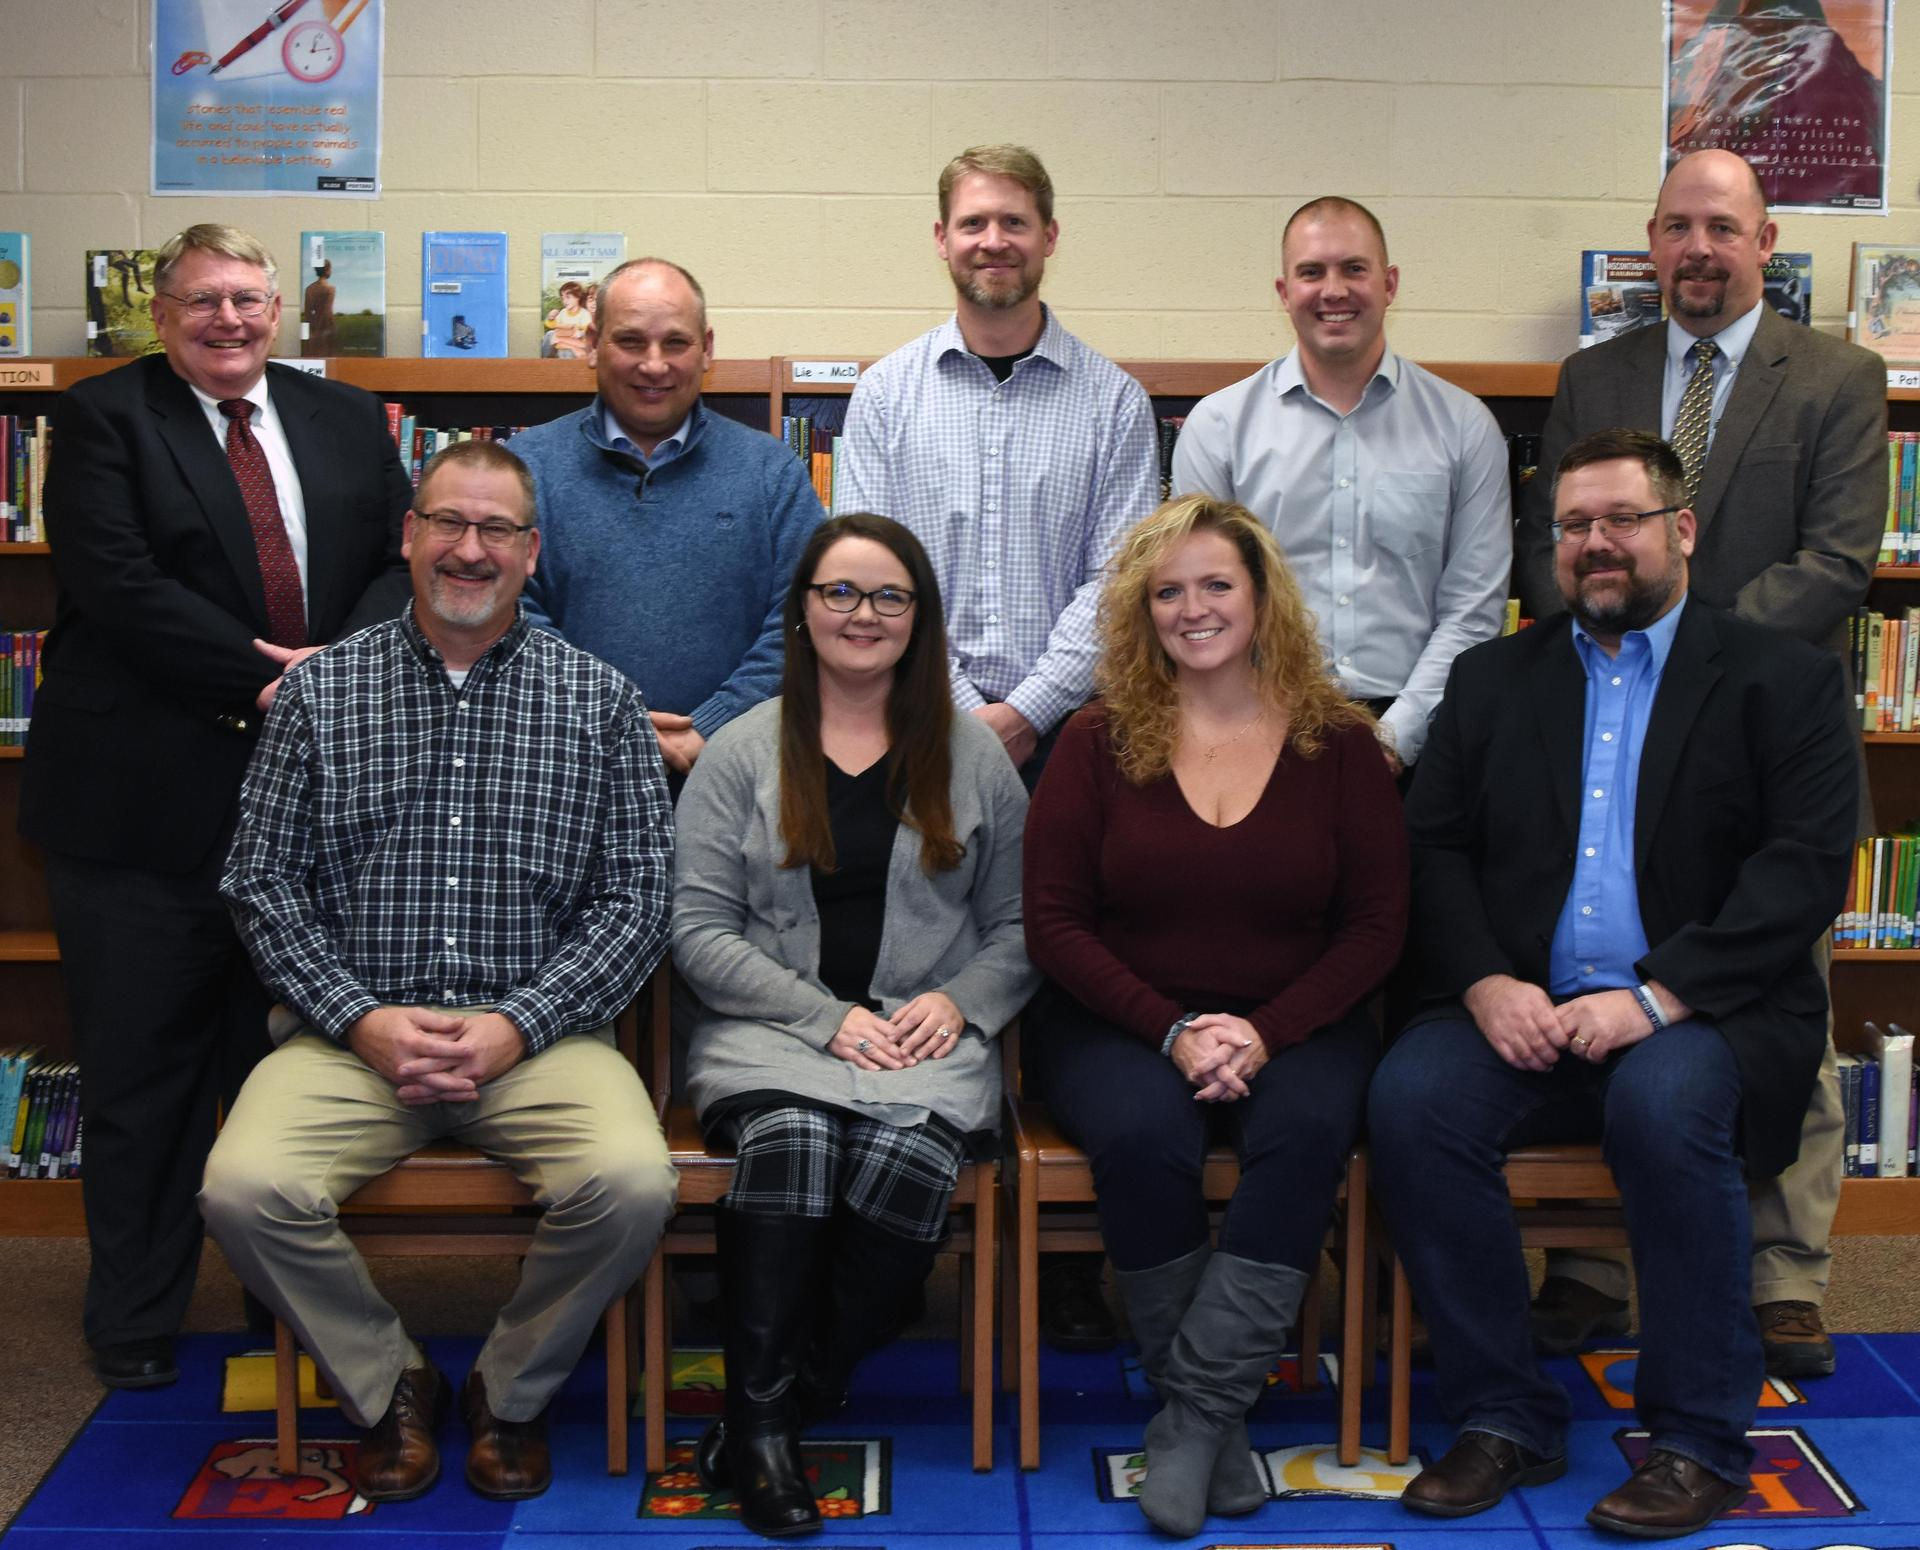 2019 Board of Directors Photo